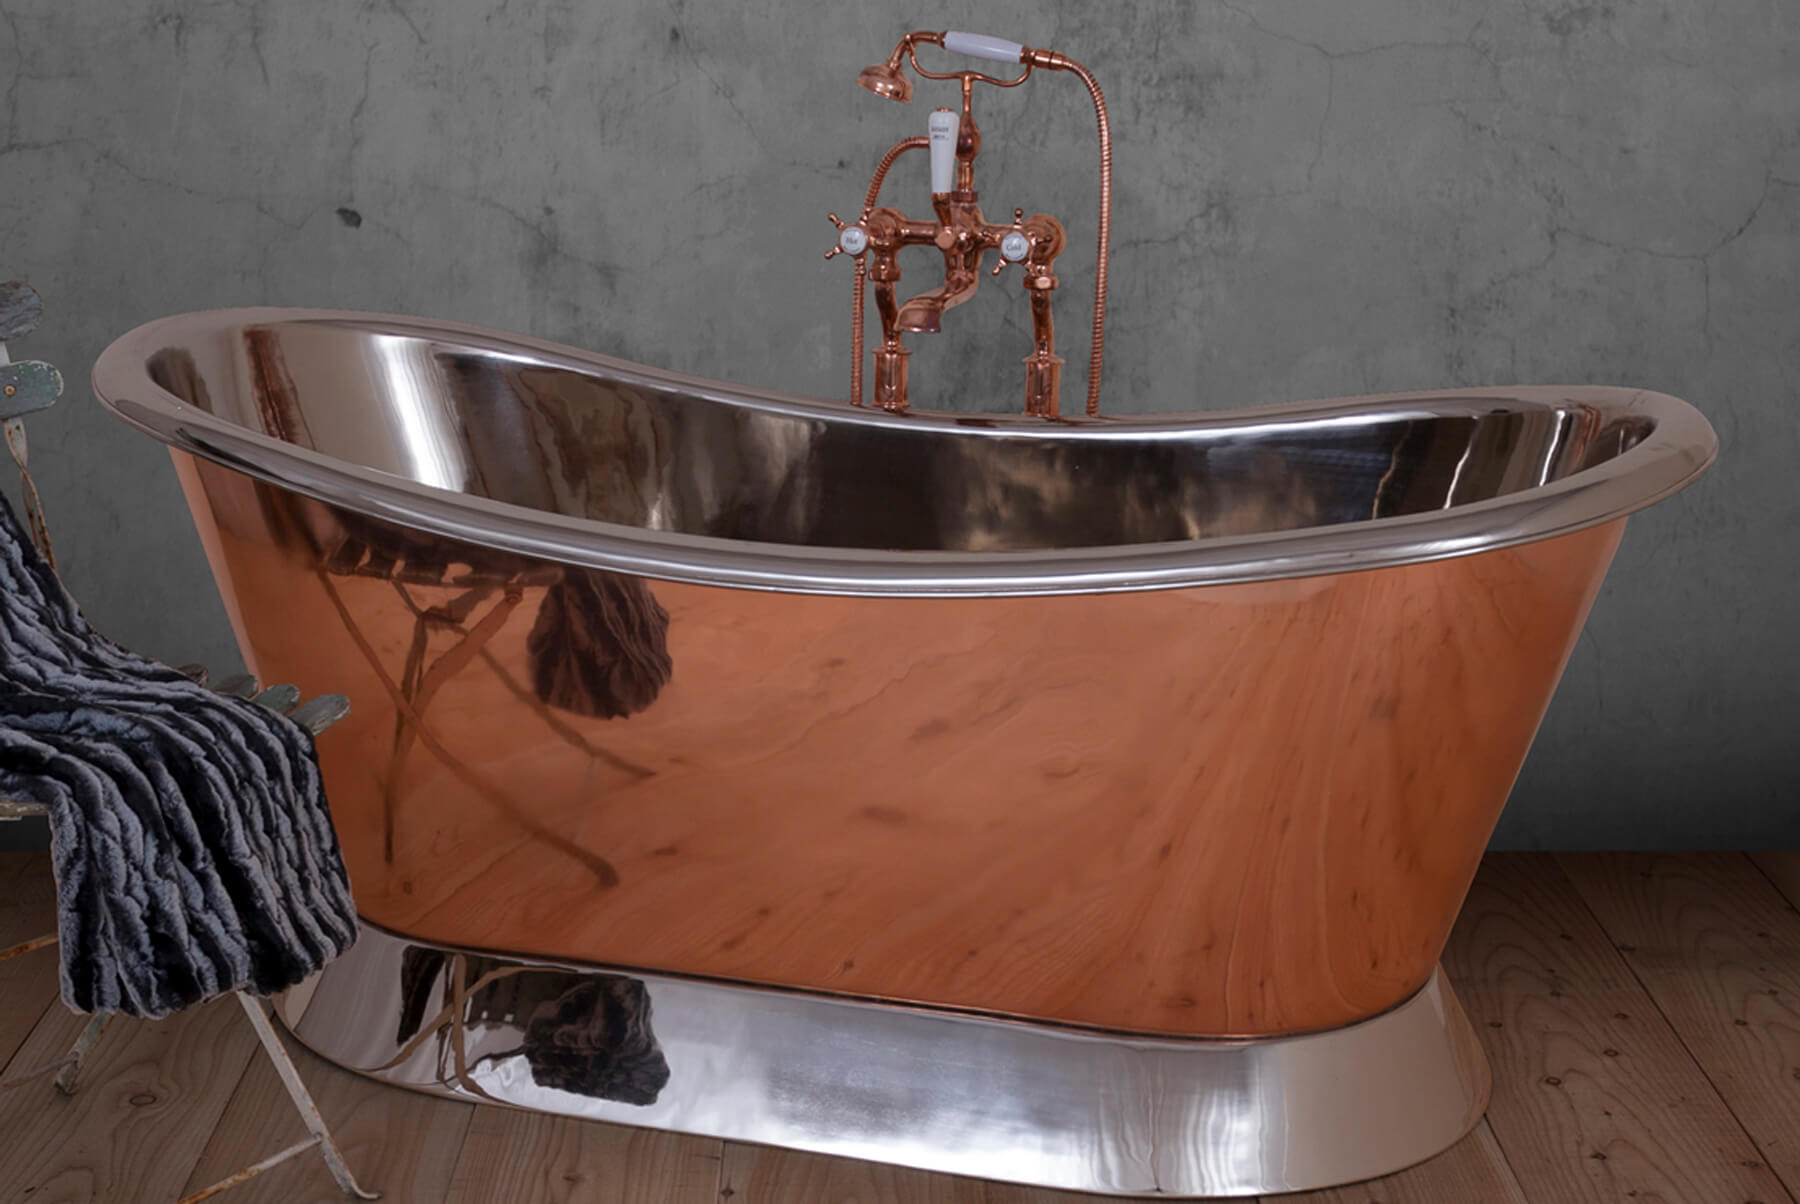 Bath-Tubs-Hurlinghma-copper-bateau-nickel-interior-plinth-1800x1204